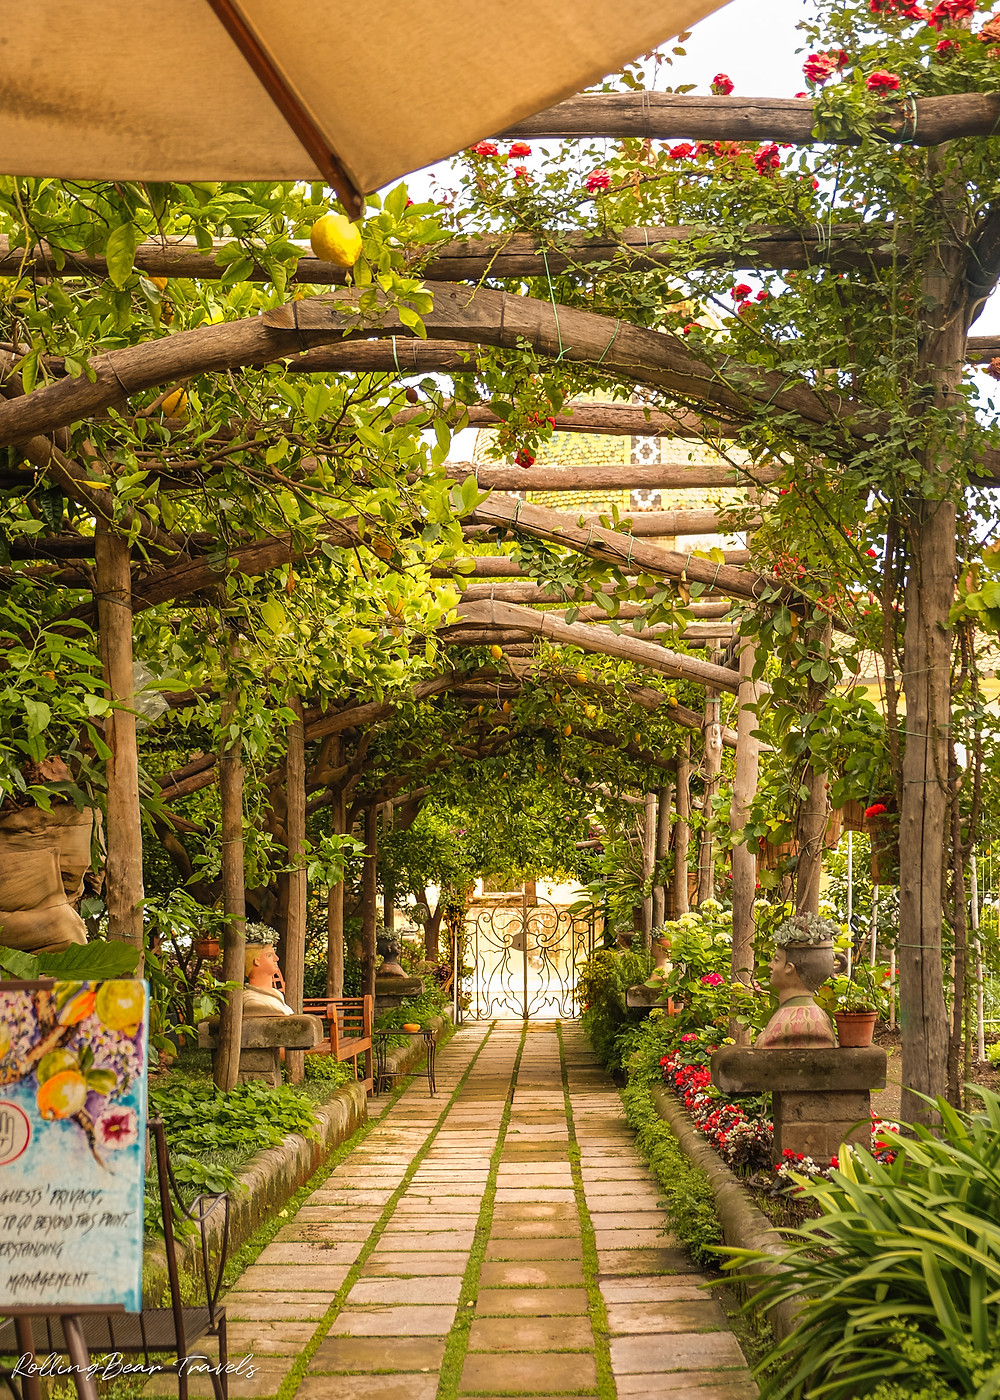 Al Palazzo restaurant ambience: Romantic garden stone walkway under vine-clad pergola | RollingBear Travels.